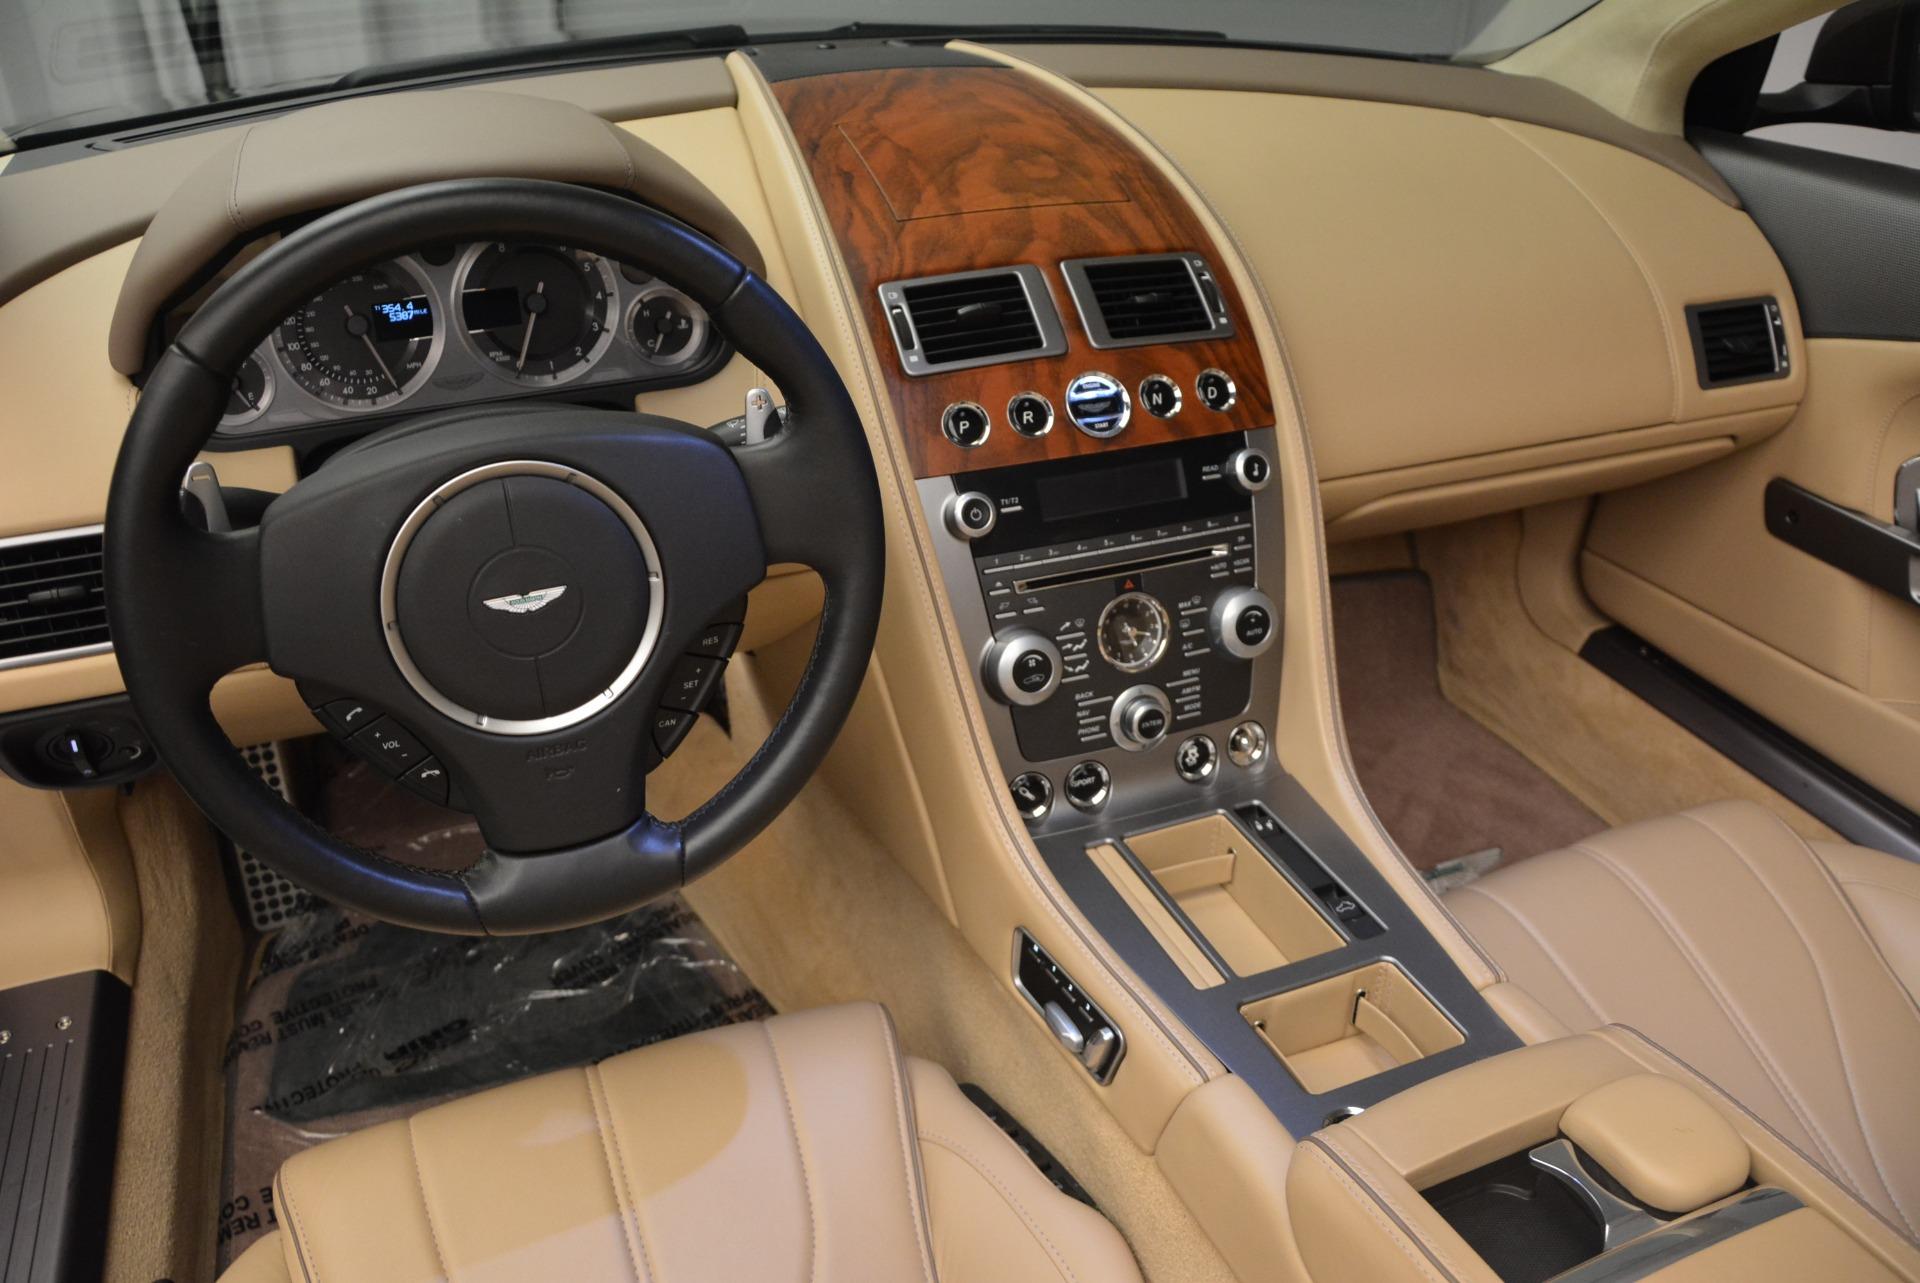 Used 2012 Aston Martin Virage Convertible For Sale In Greenwich, CT. Alfa Romeo of Greenwich, 7613 3351_p22